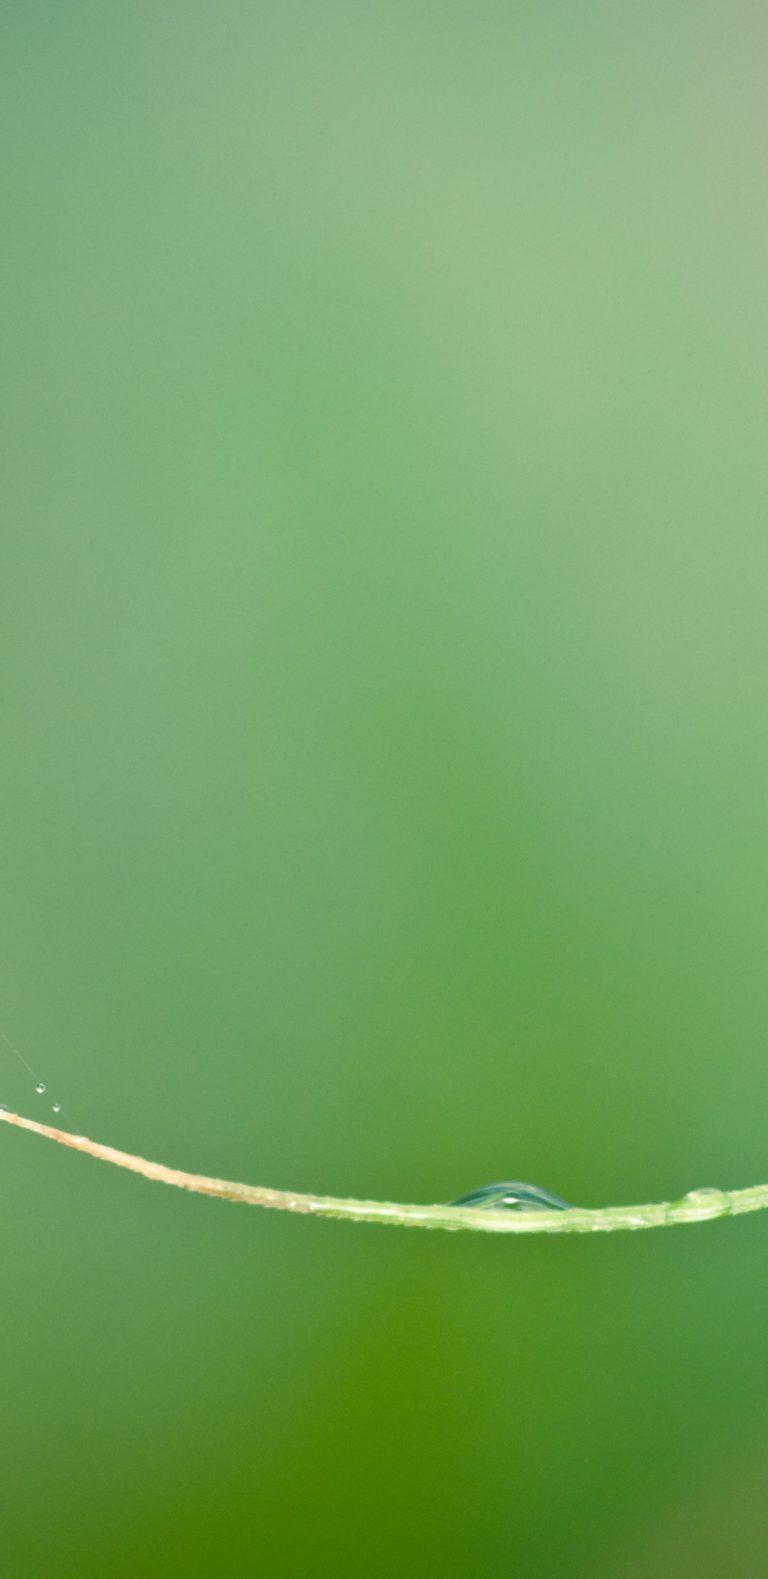 Nature Flower Garden Wild Drop 1080x2220 768x1579